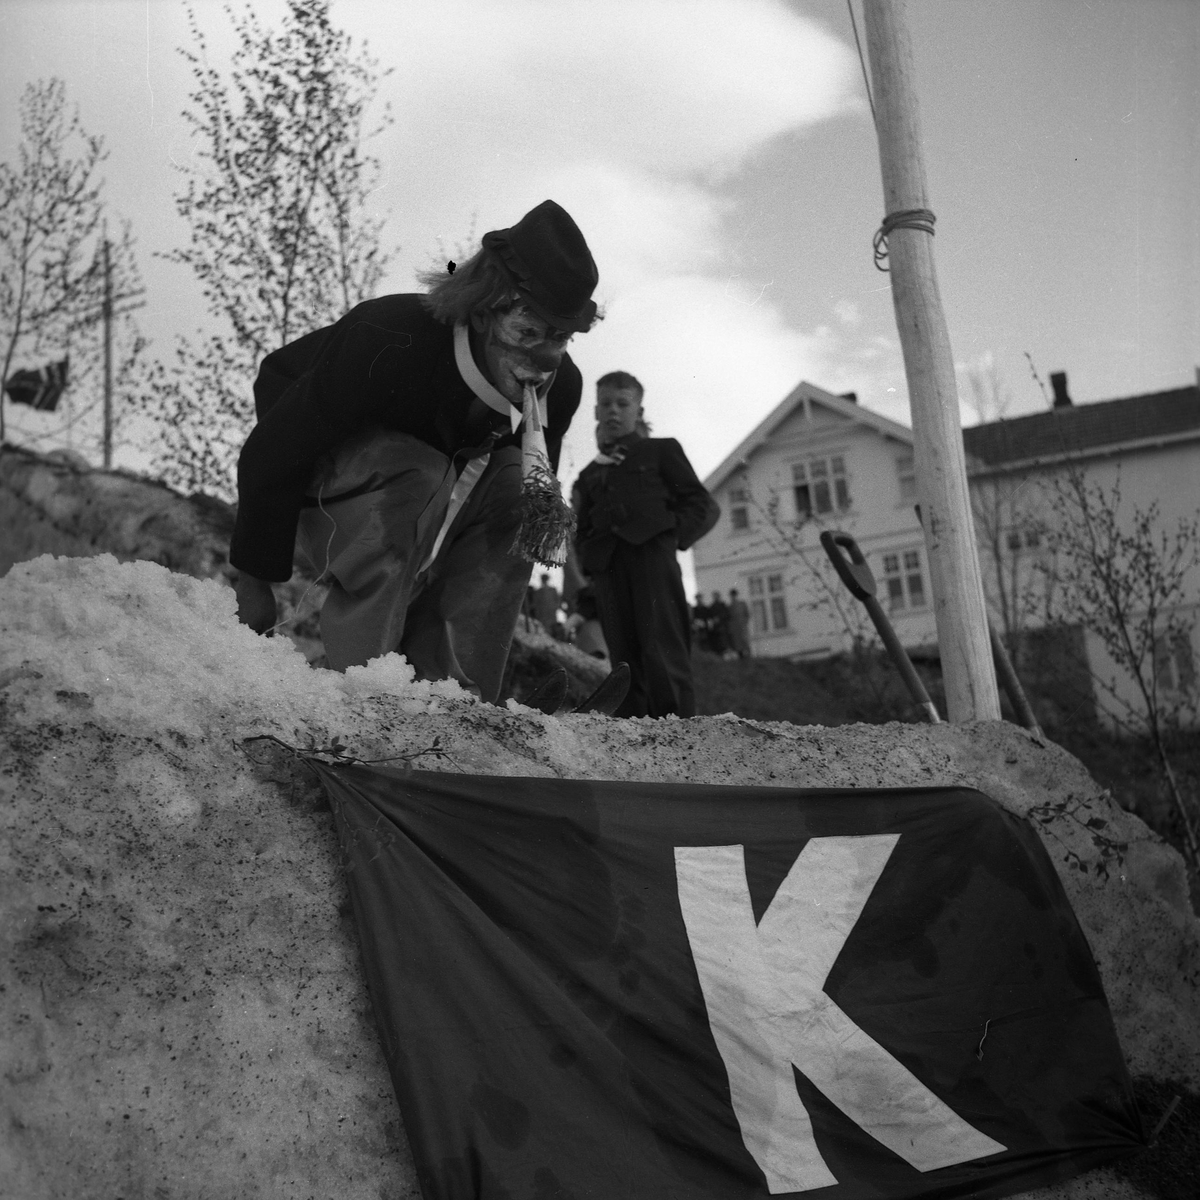 Ski show ar Skauløkka, Kongsberg